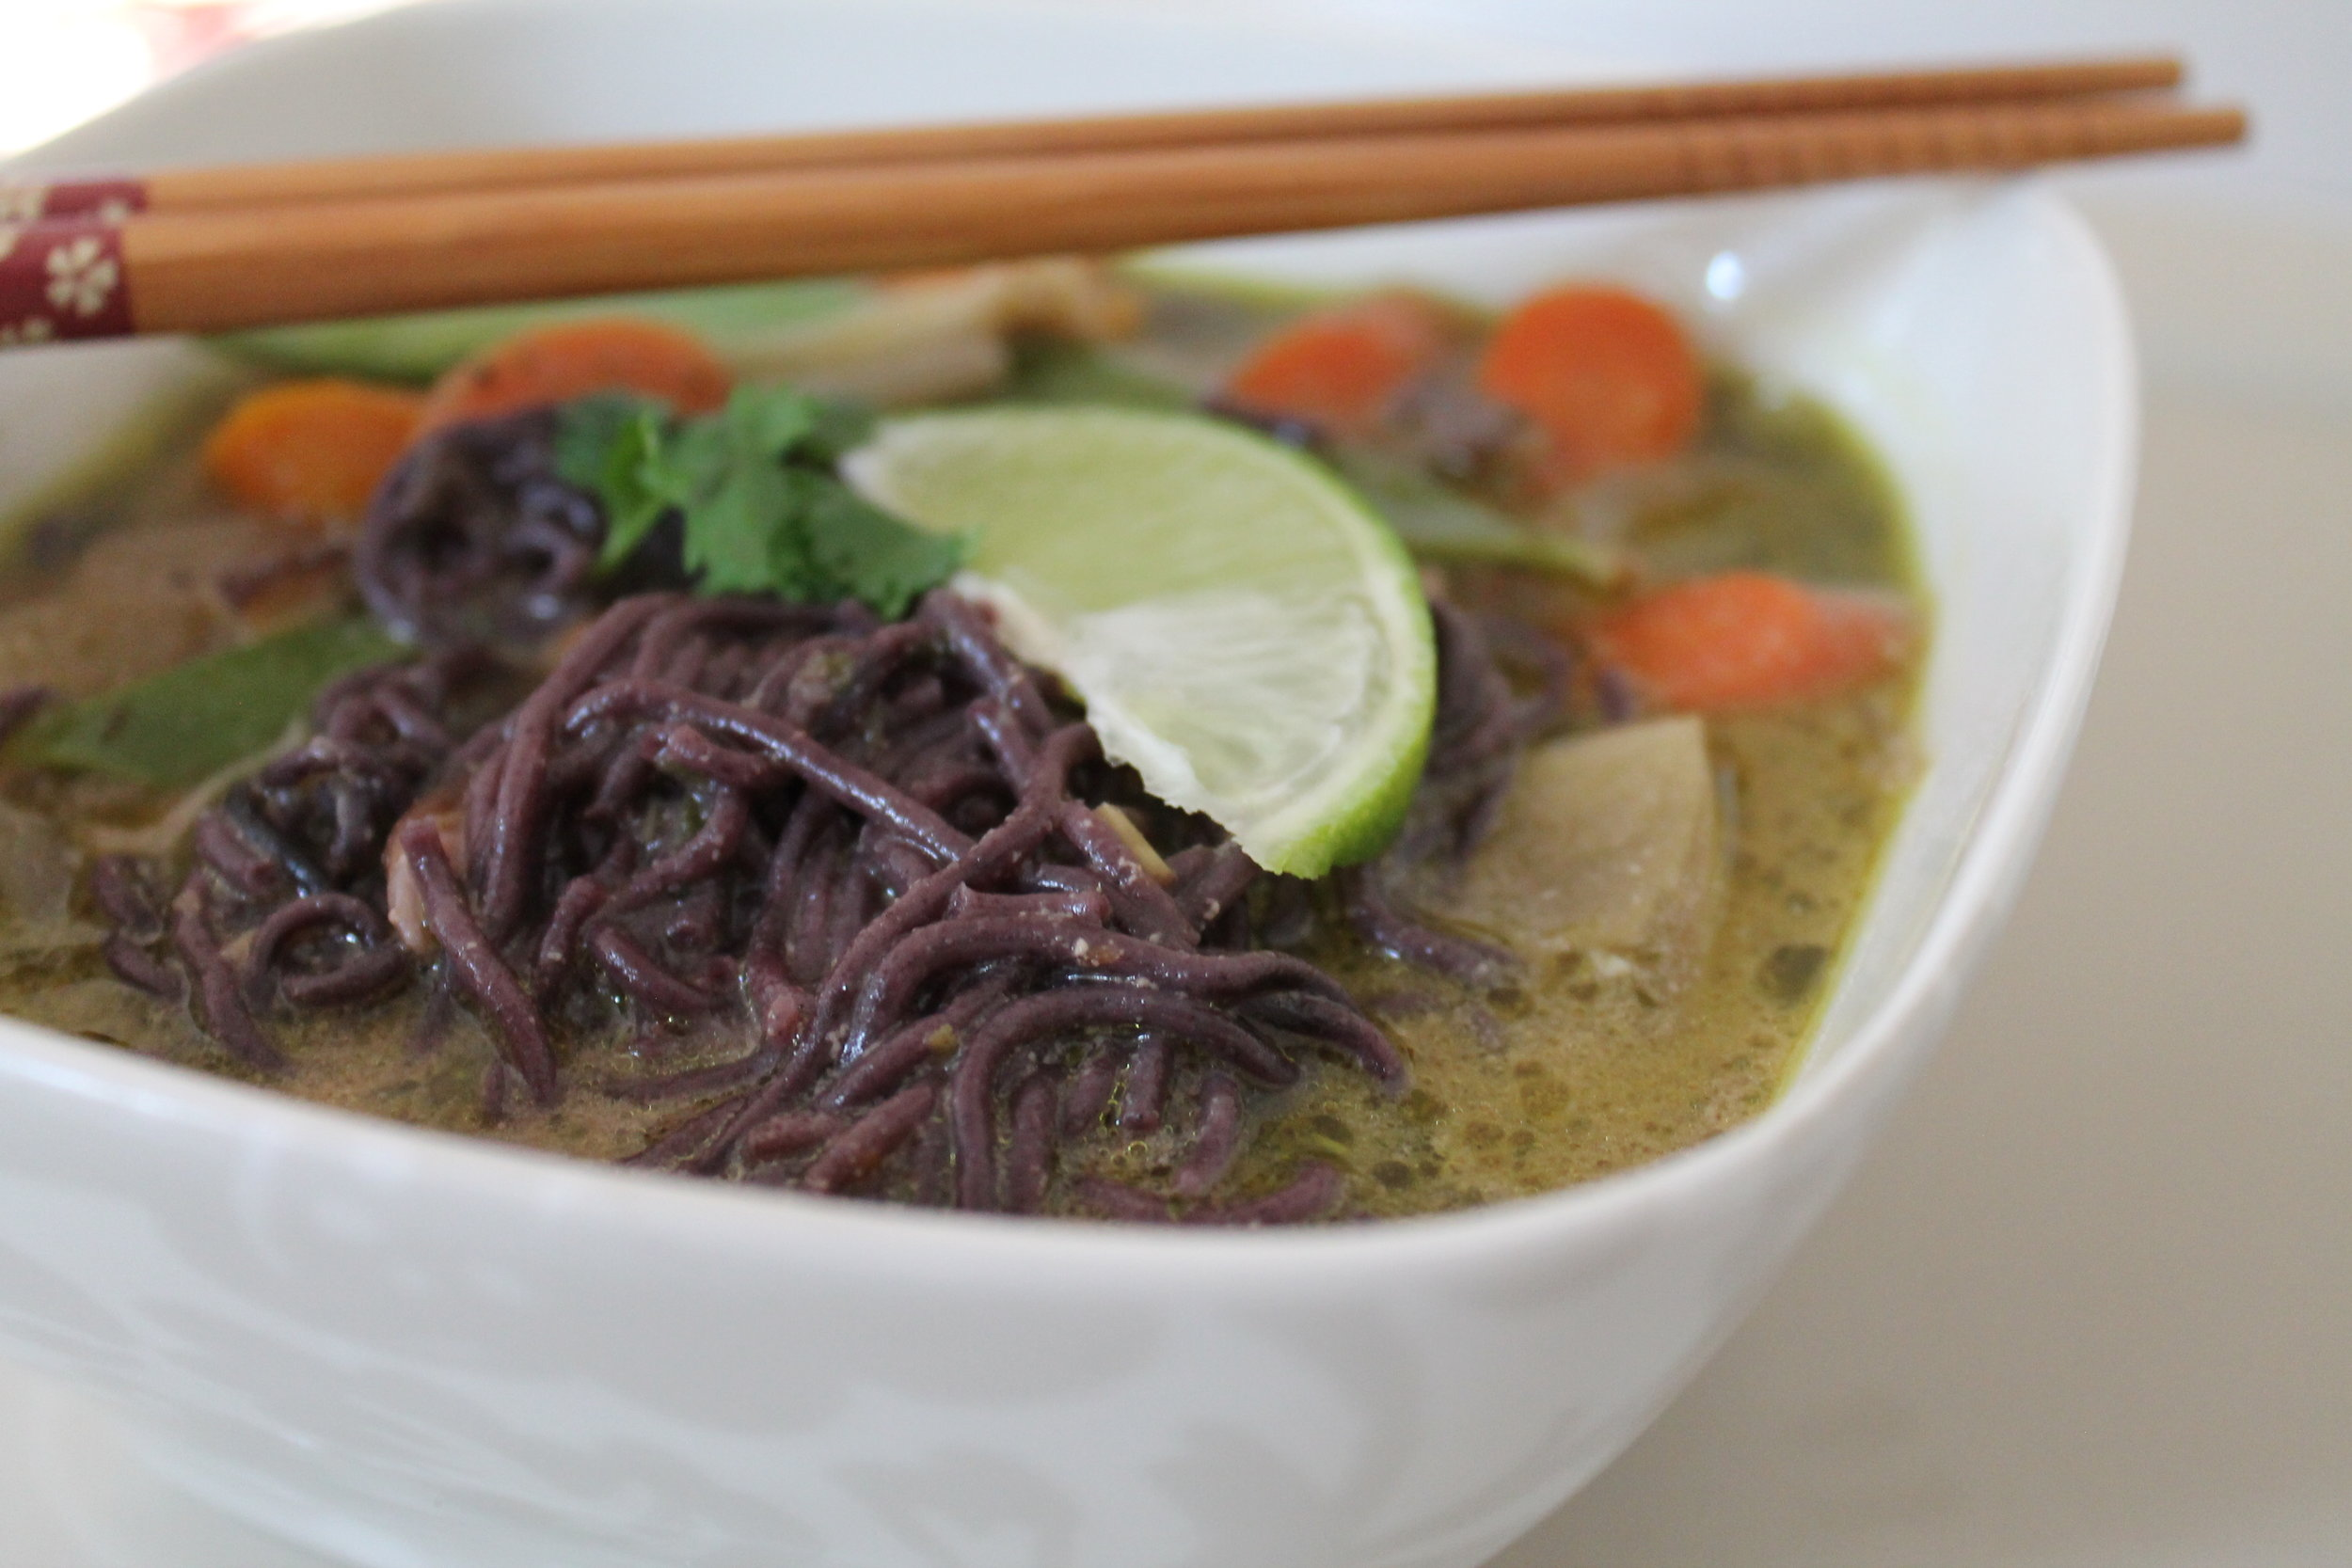 Green Curry Vegetable Soup served over forbidden black rice noodles.